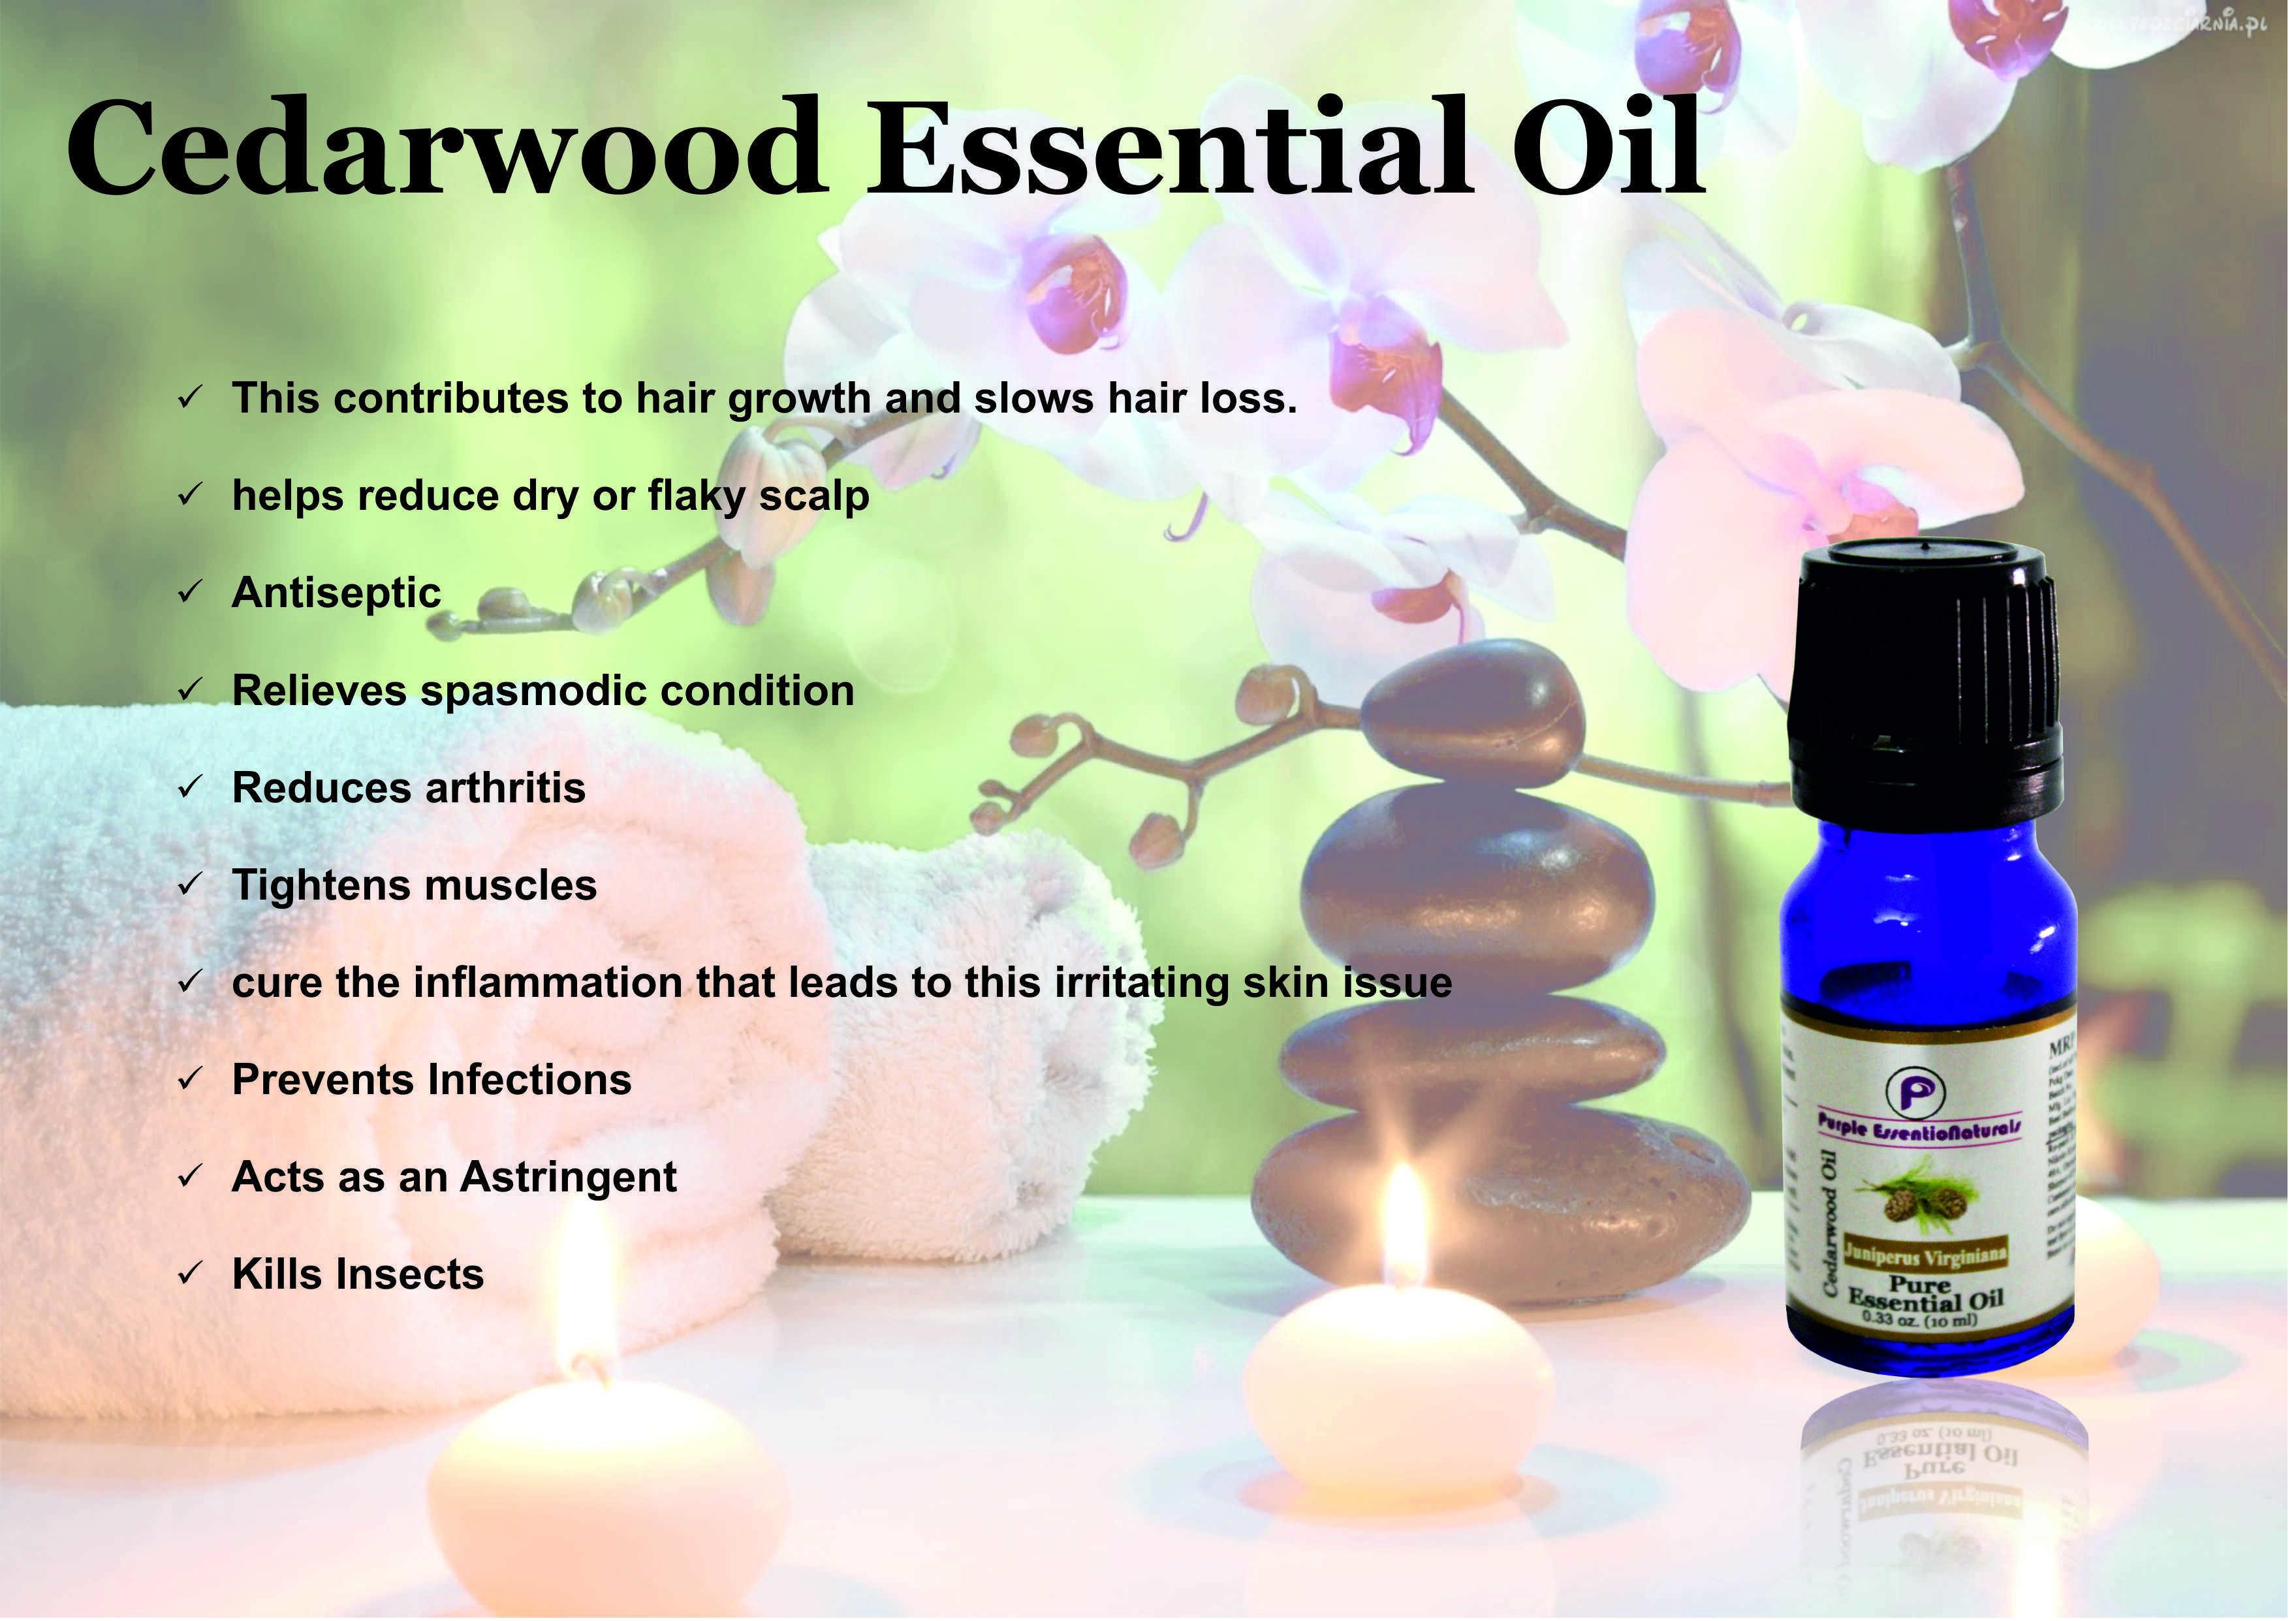 Cedar wood Essential Oil